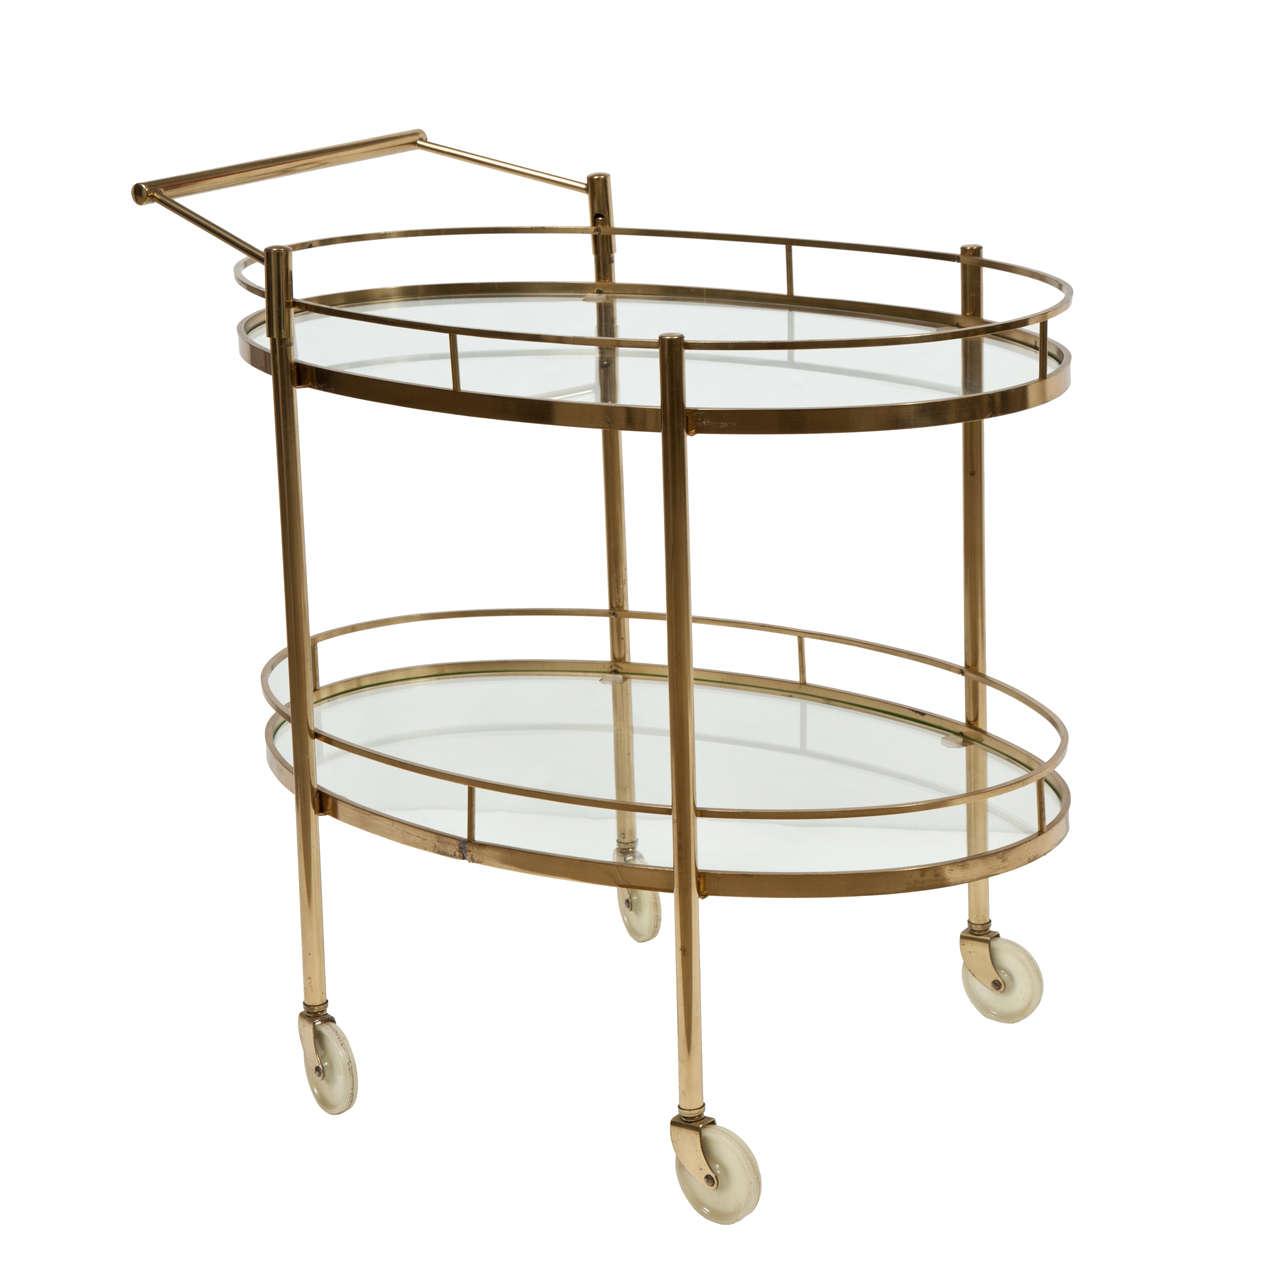 Solid Brass Mid Century Modern Oval Bar Or Tea Cart At 1stdibs